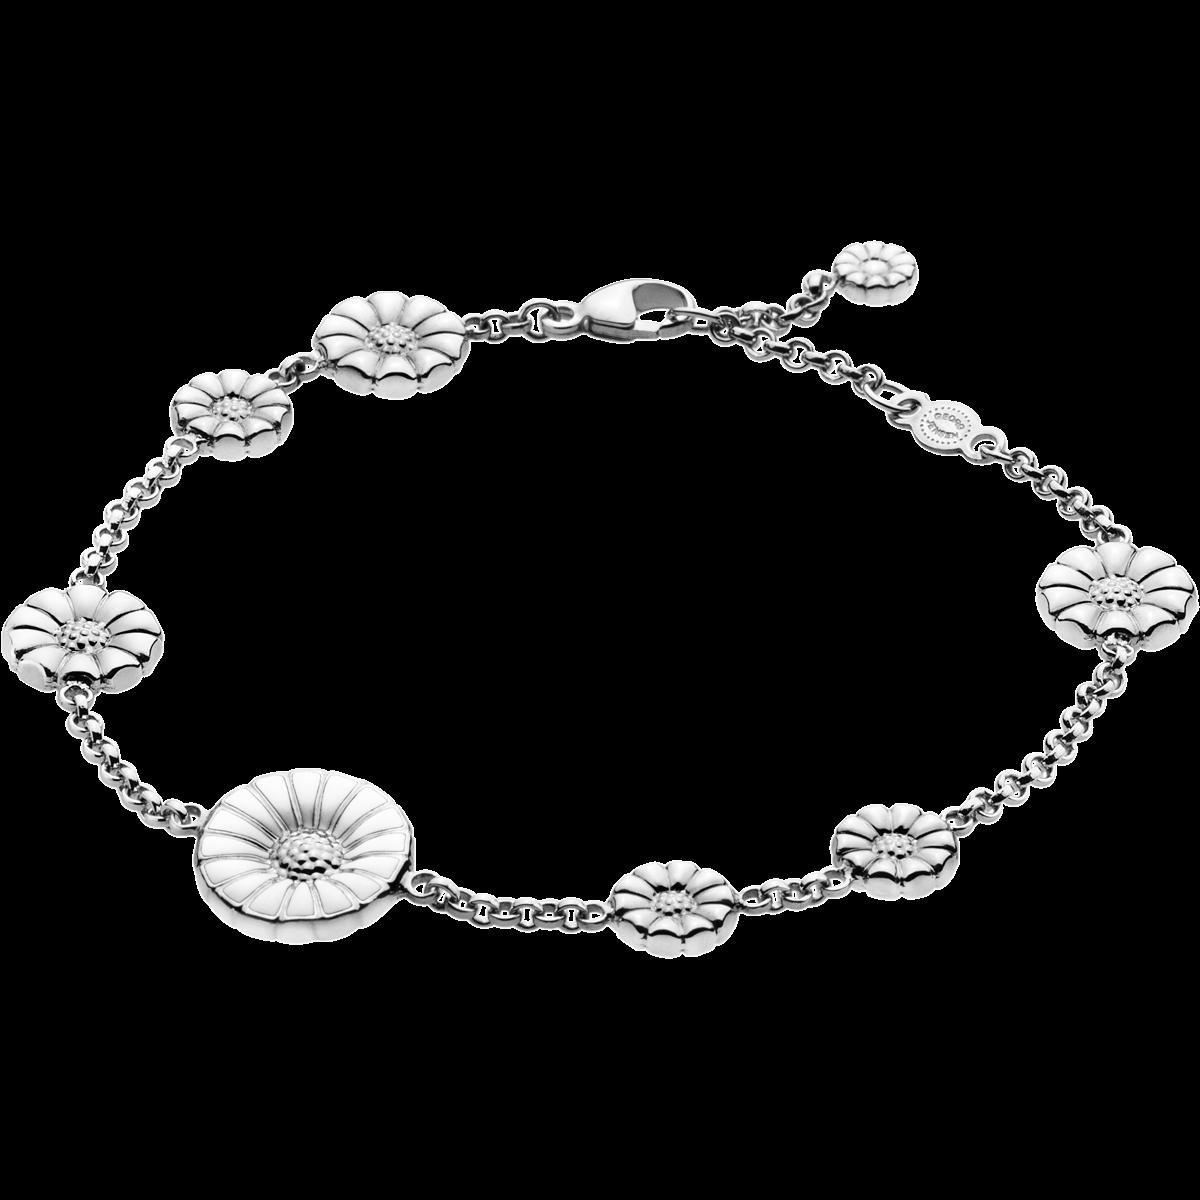 Gold Silver And Diamond Women S Bracelets Shop At Georg Jensen